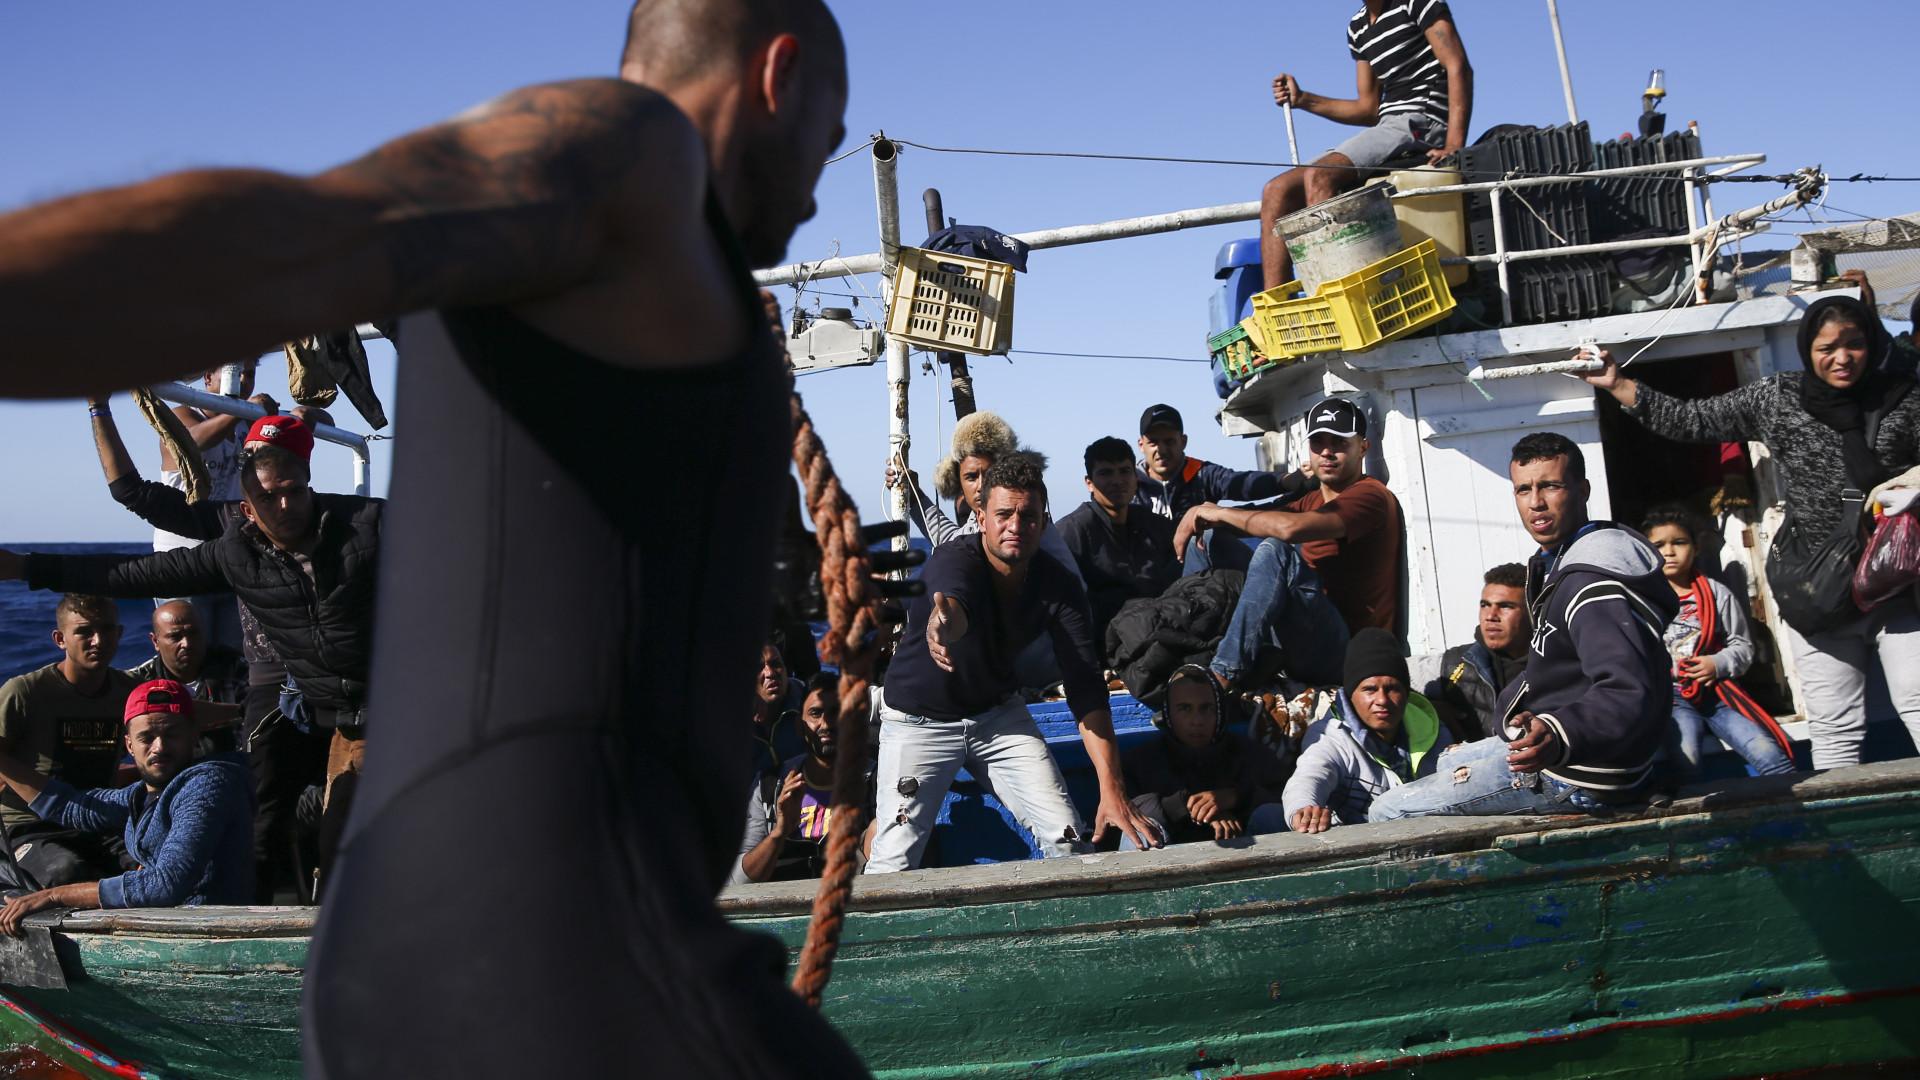 Lampedusa: Mais de 400 migrantes transferidos para navios militares